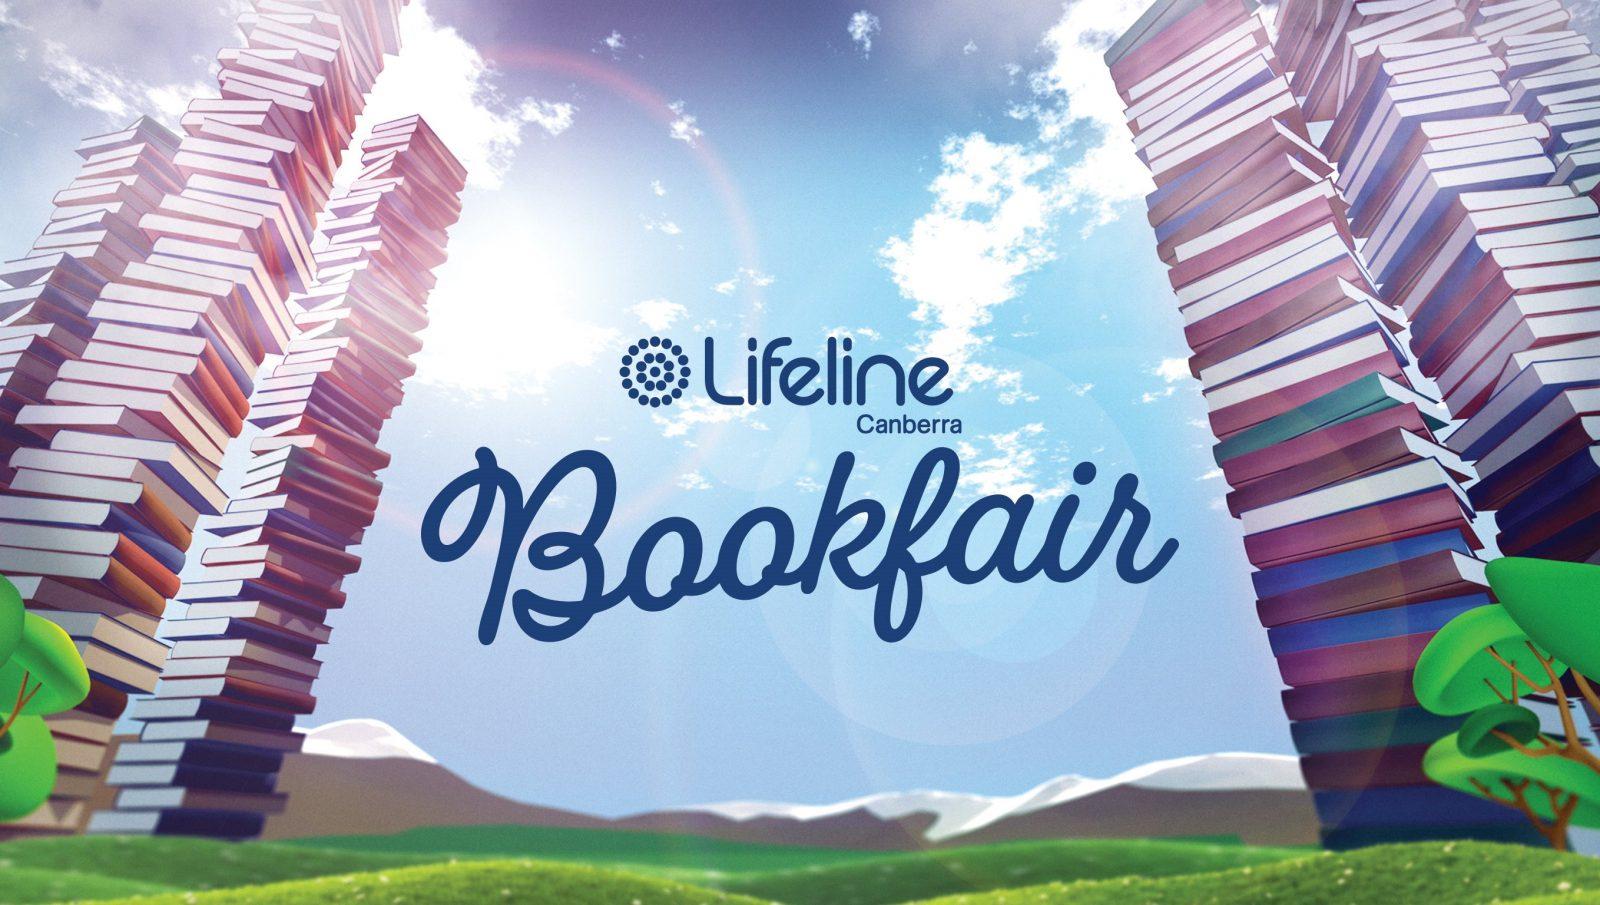 https://act.lifeline.org.au/bookfair/